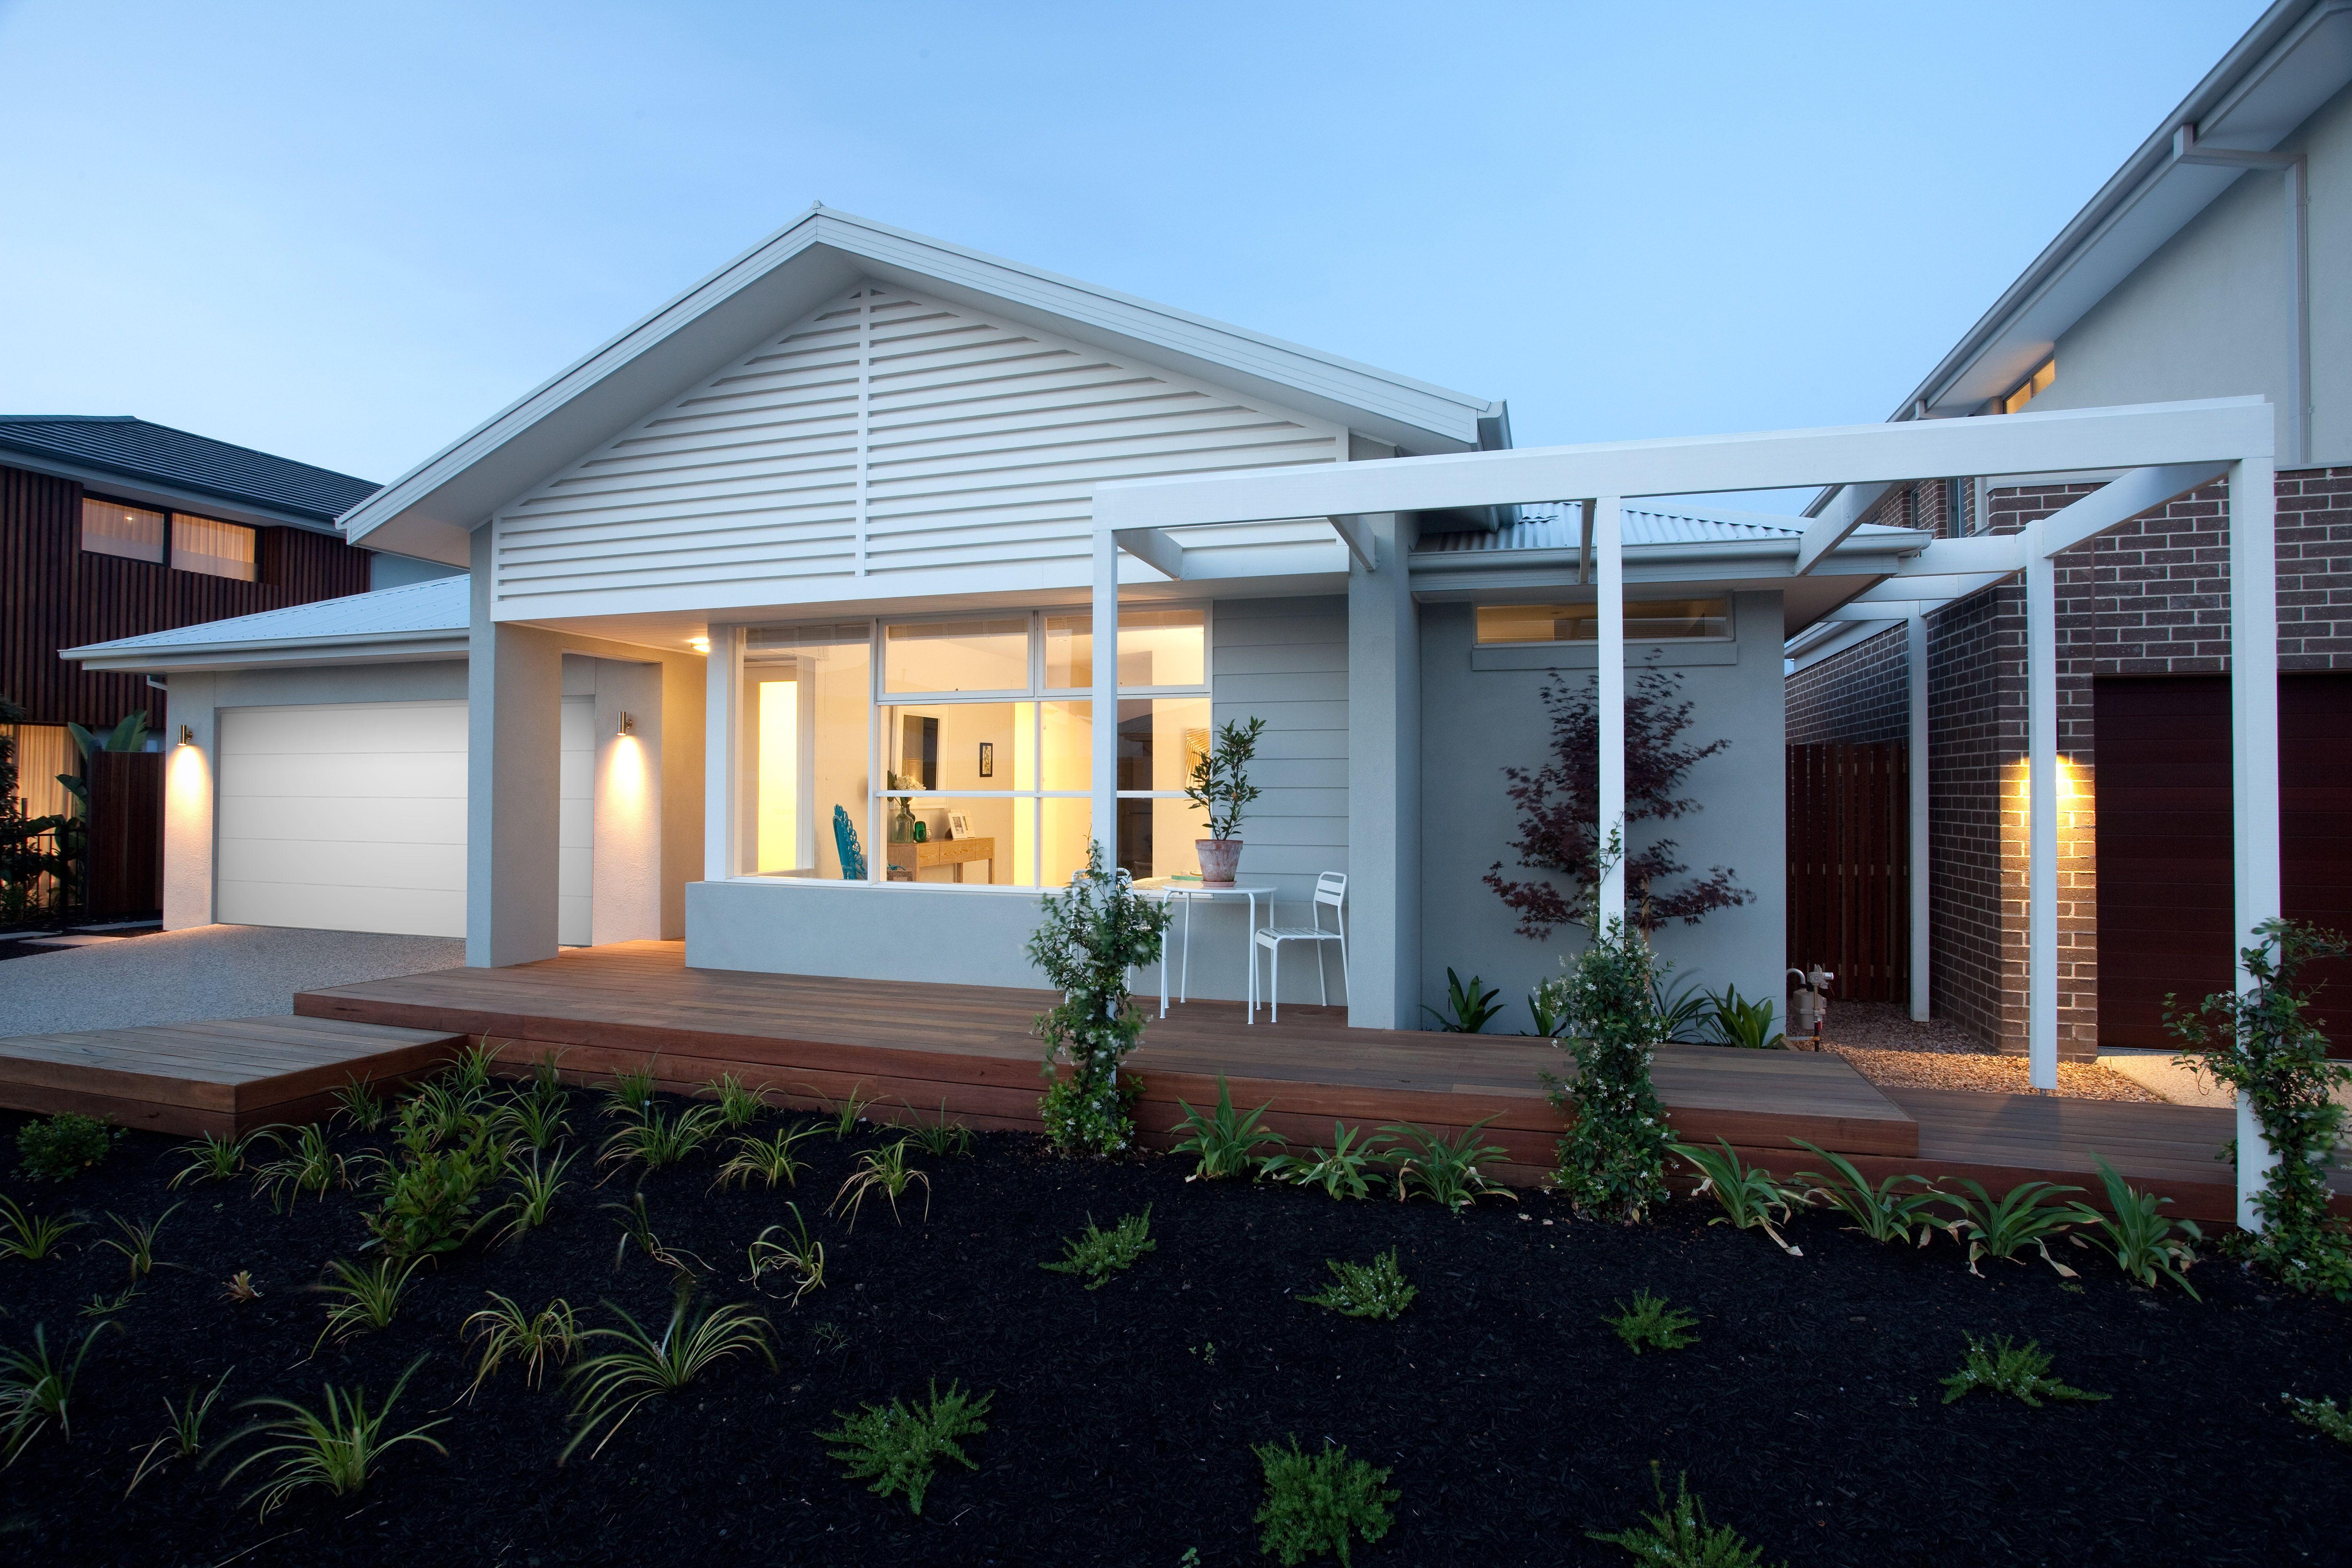 Construction also hotondo homes erskine berwick beach house pinterest rh